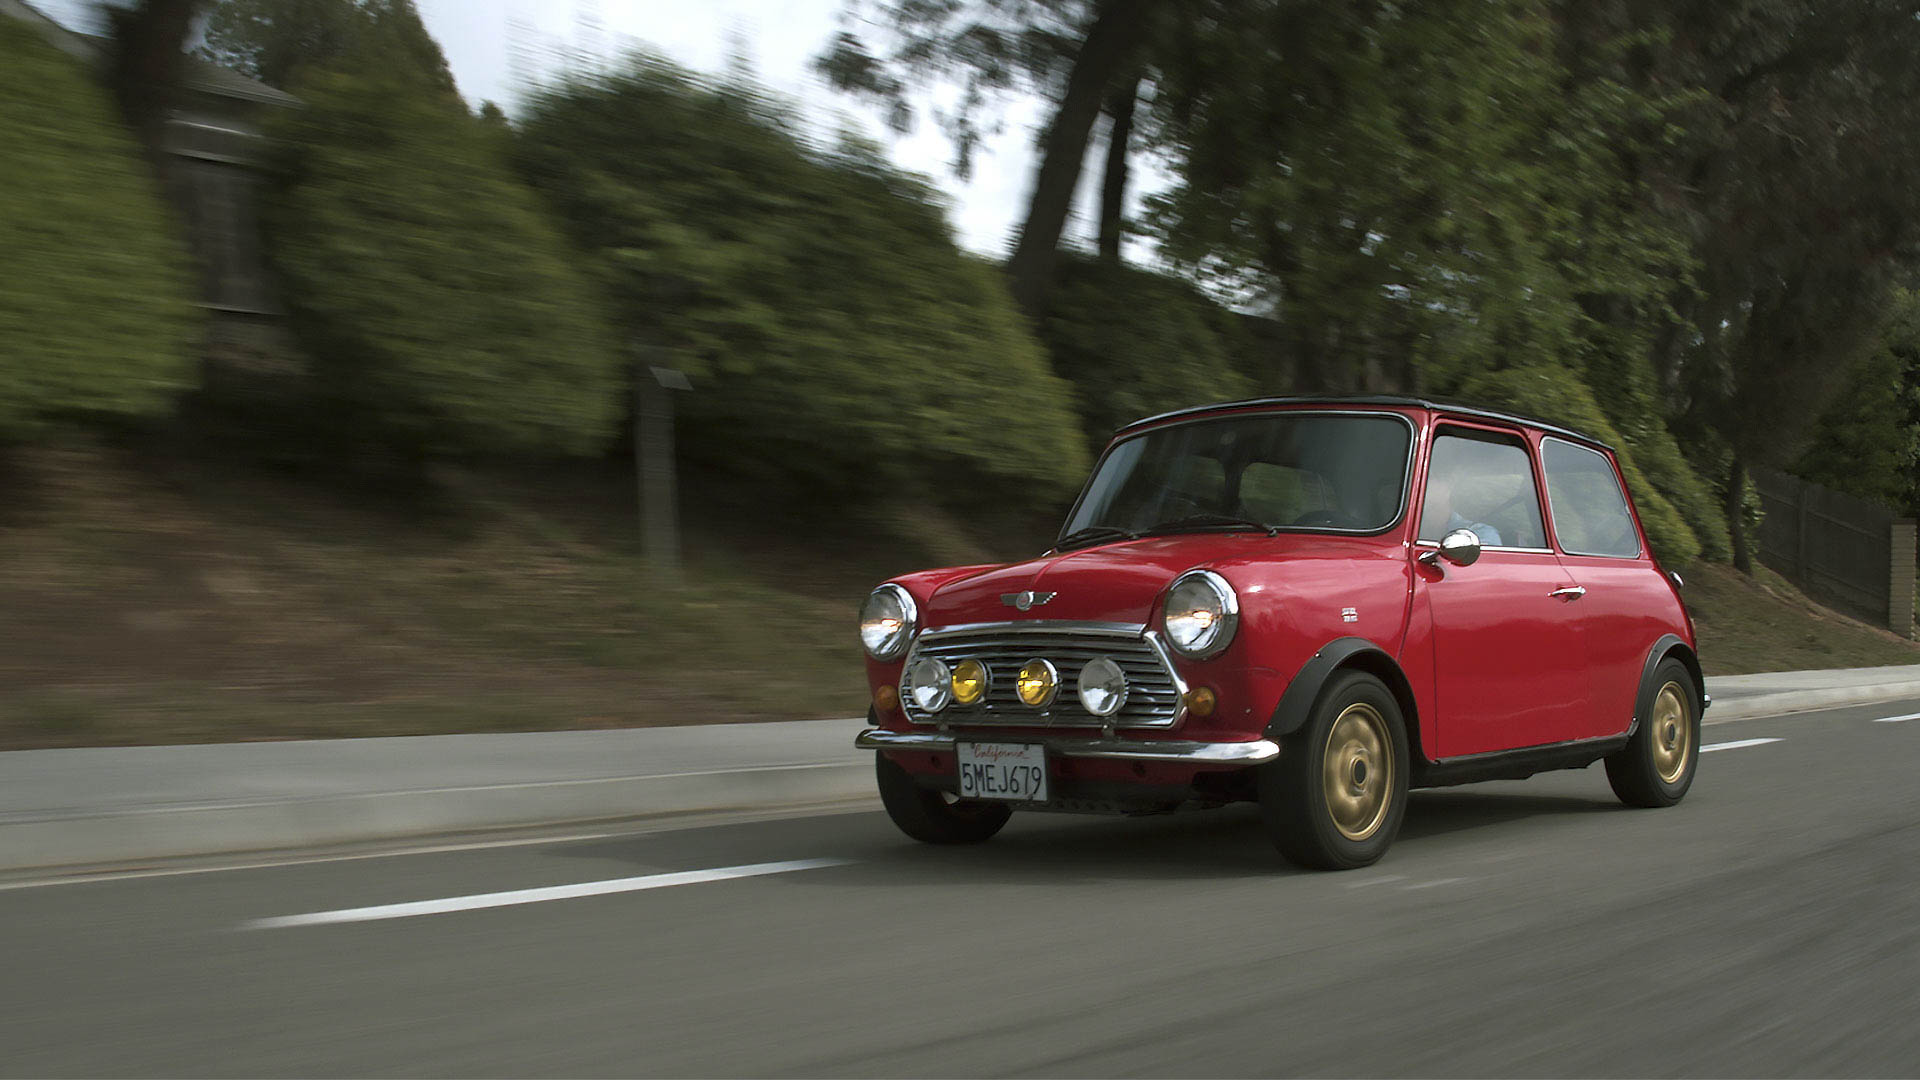 1973 Mini Cooper driving